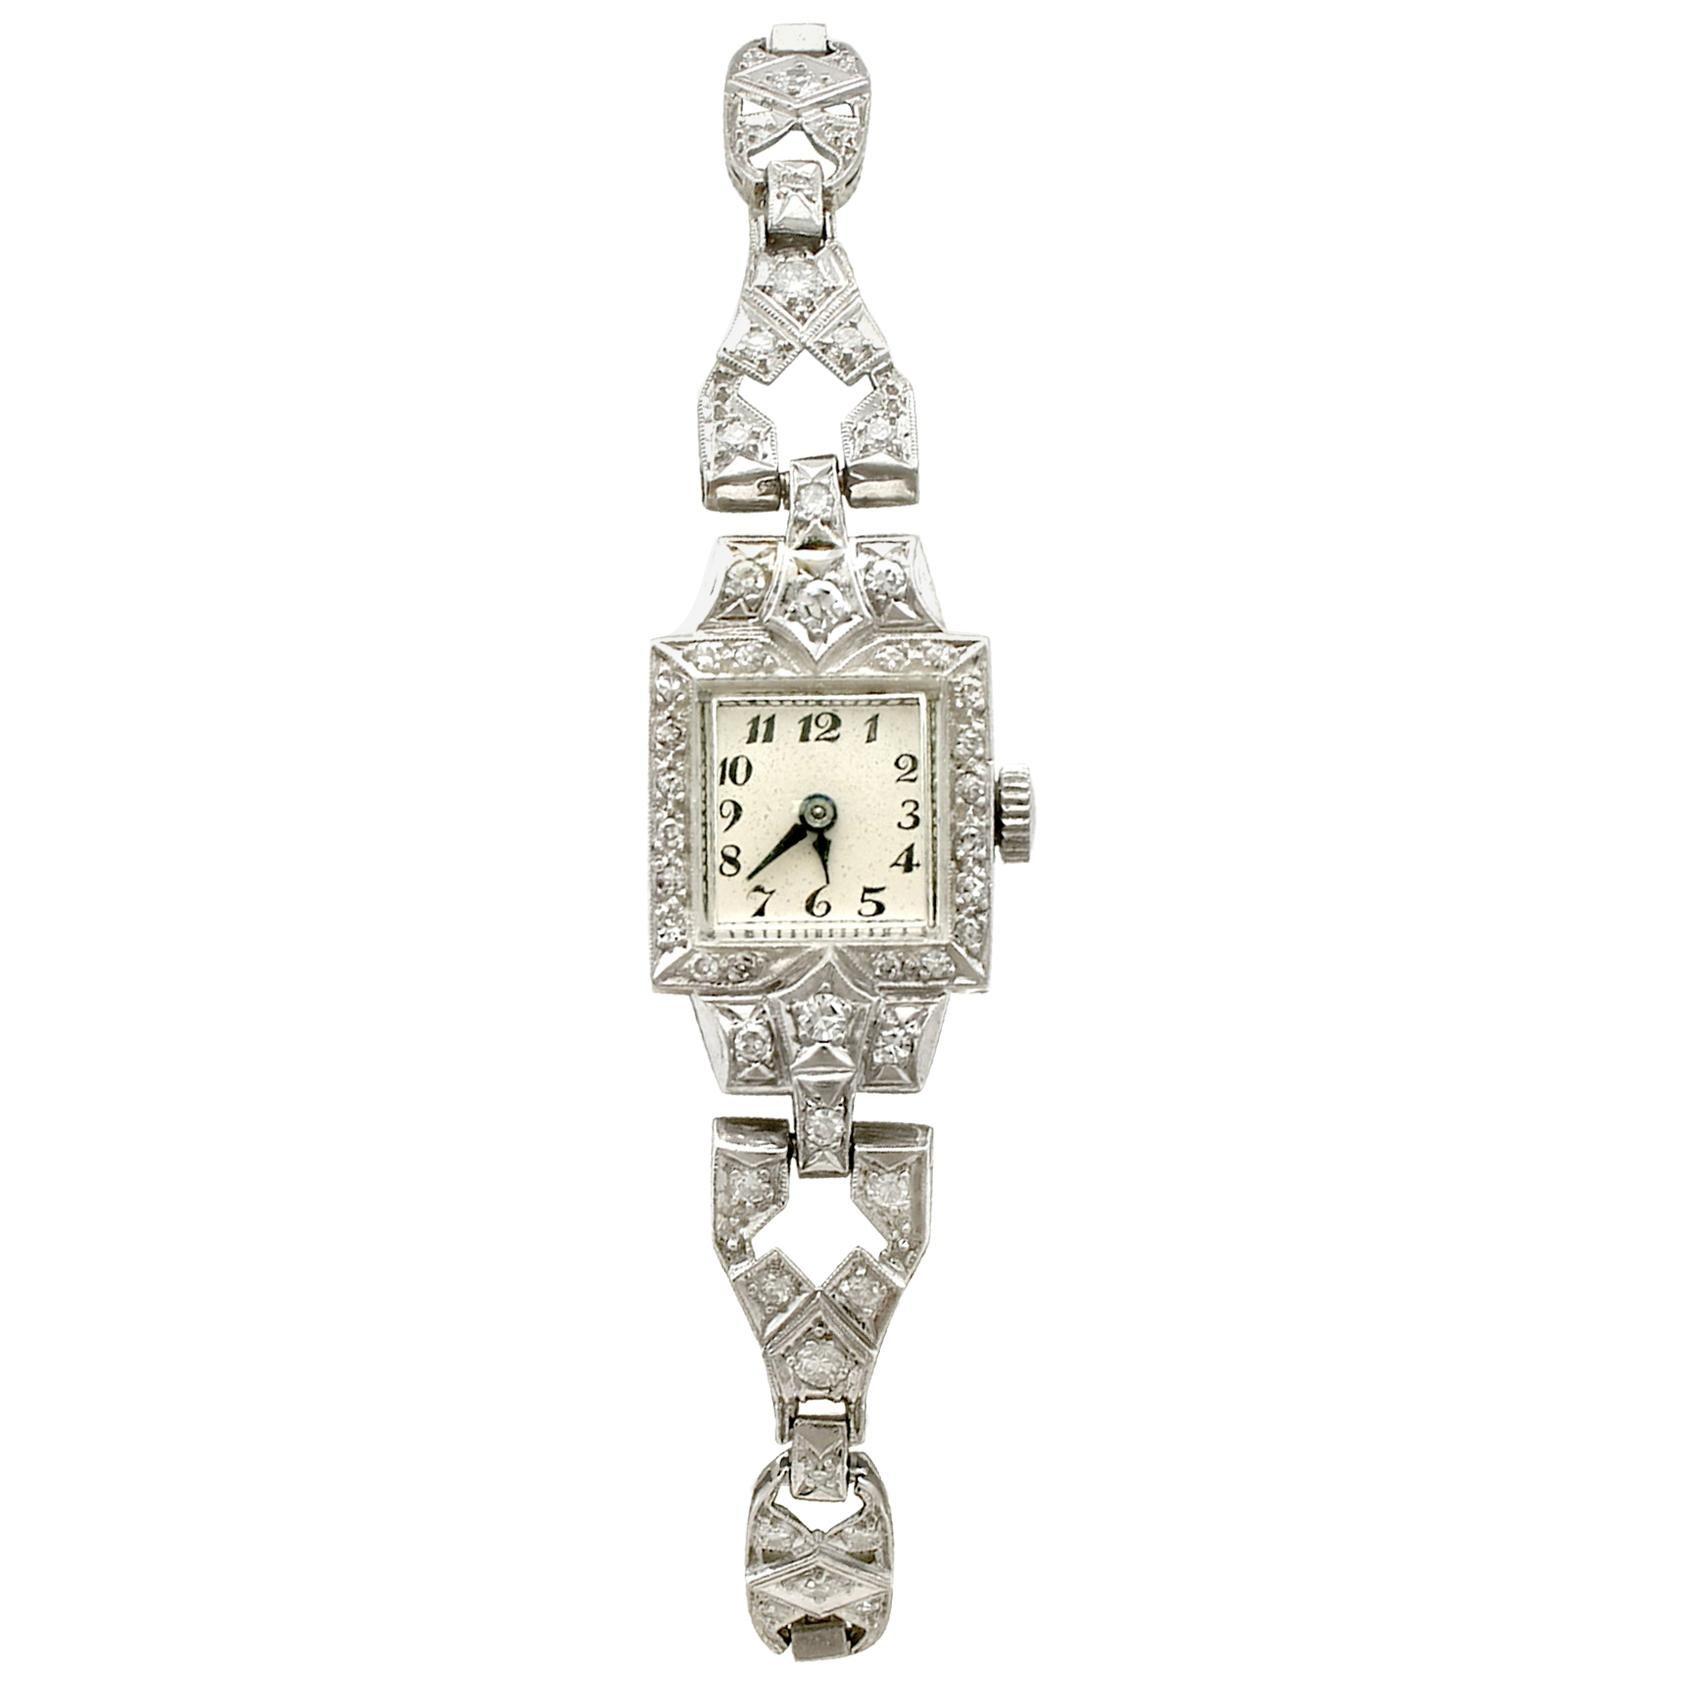 Antique 1935 1.93 Carat Diamond and Platinum Cocktail Watch